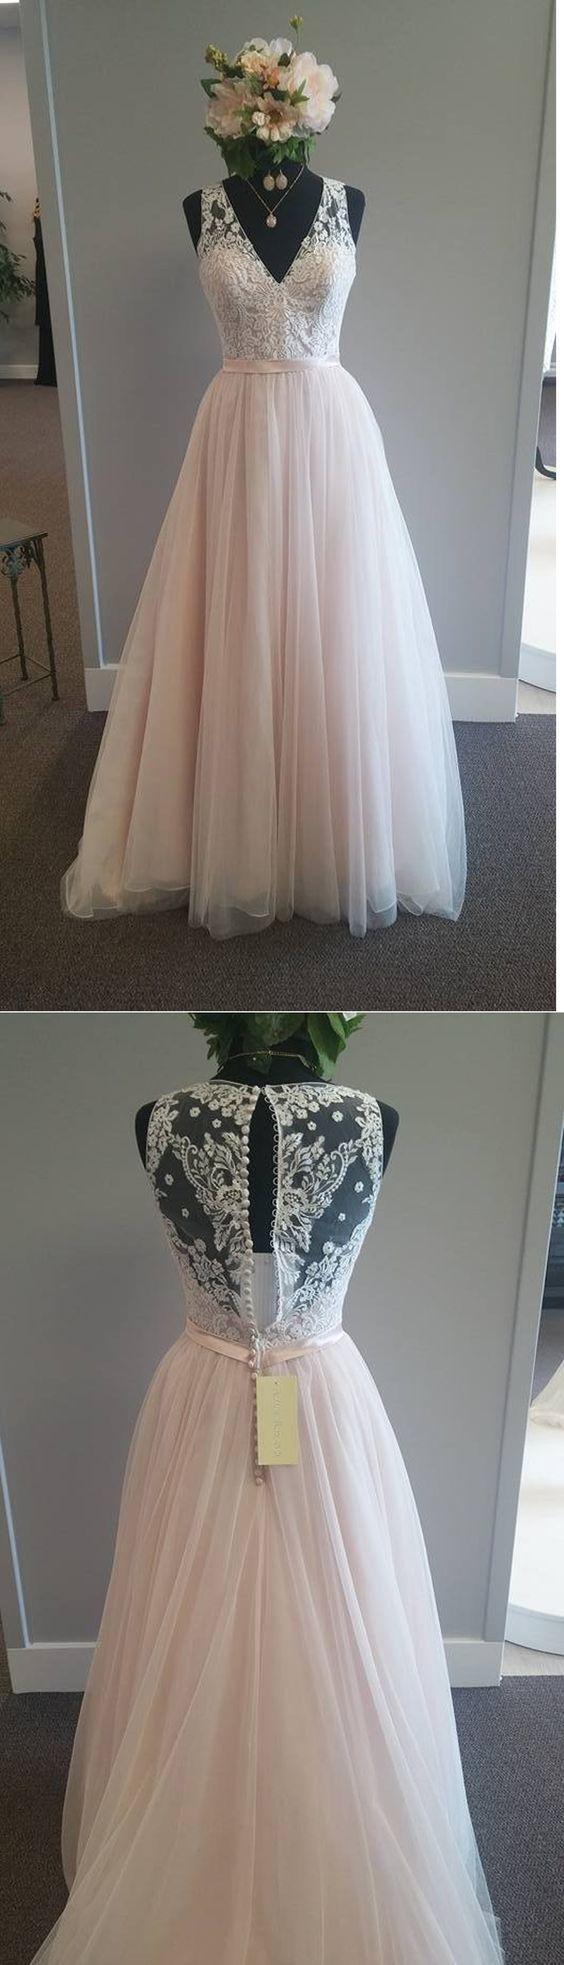 Light Pink Sleeveless Lace Appliques A Line Floor Length Wedding Dress Plus Size Wedding Dress Pink Wedding Dresses Light Pink Wedding Dress Beach Wedding Gown [ 1965 x 564 Pixel ]